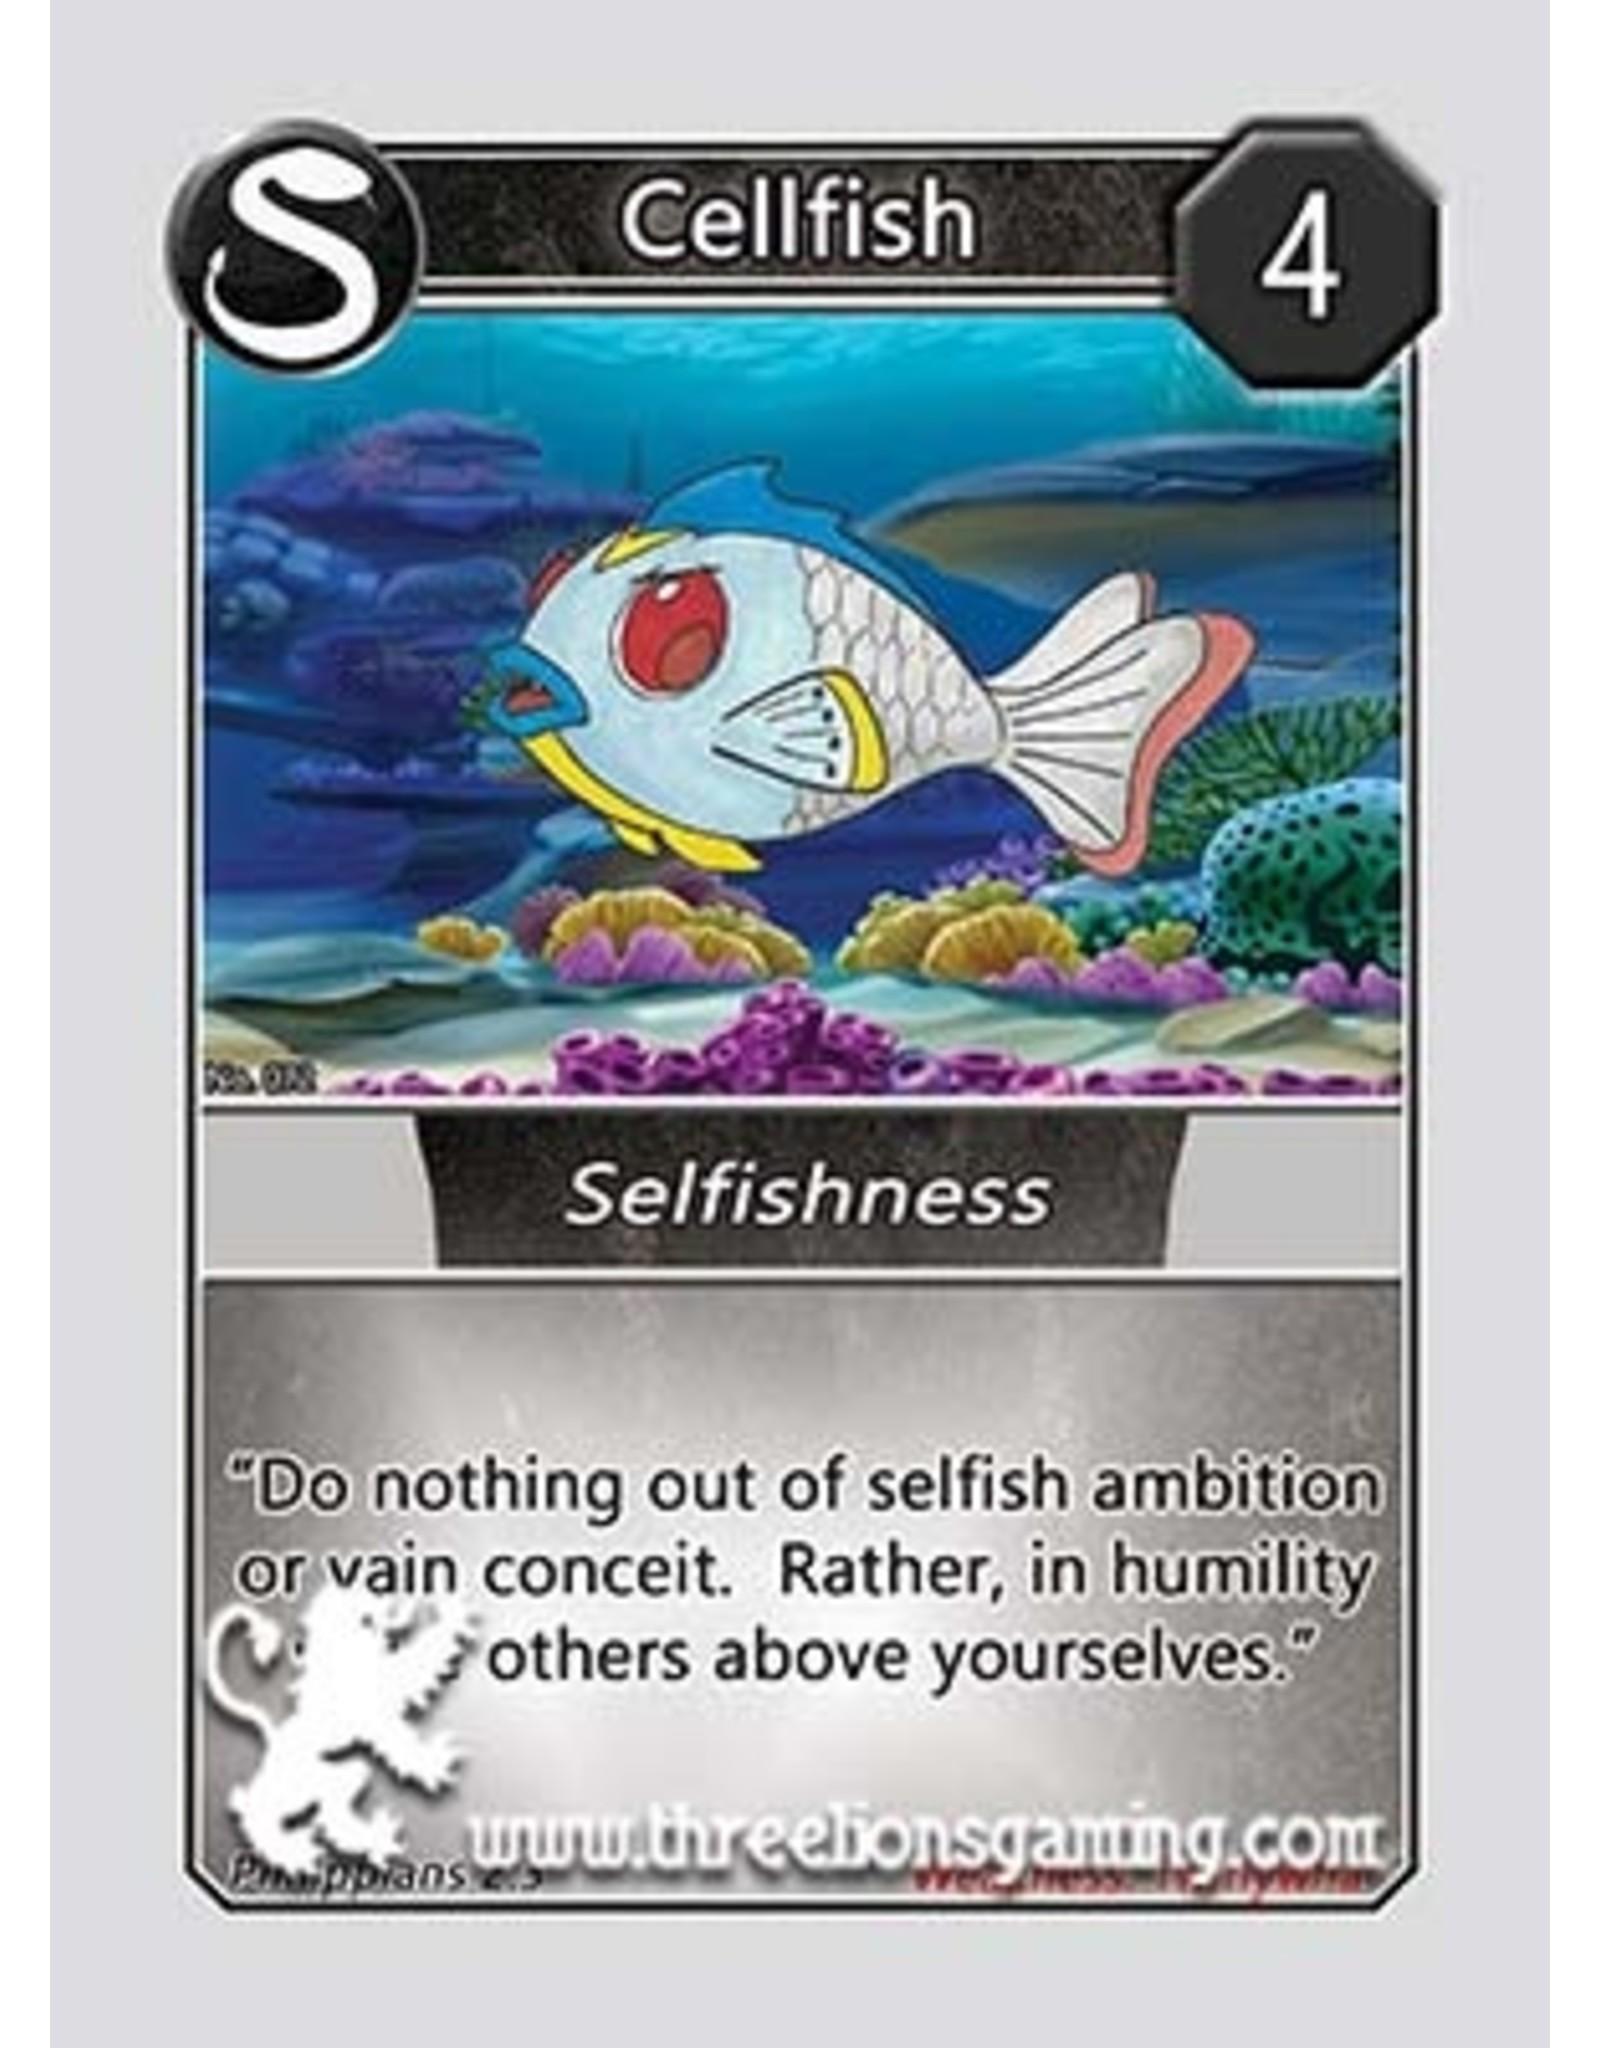 S1: Cellfish